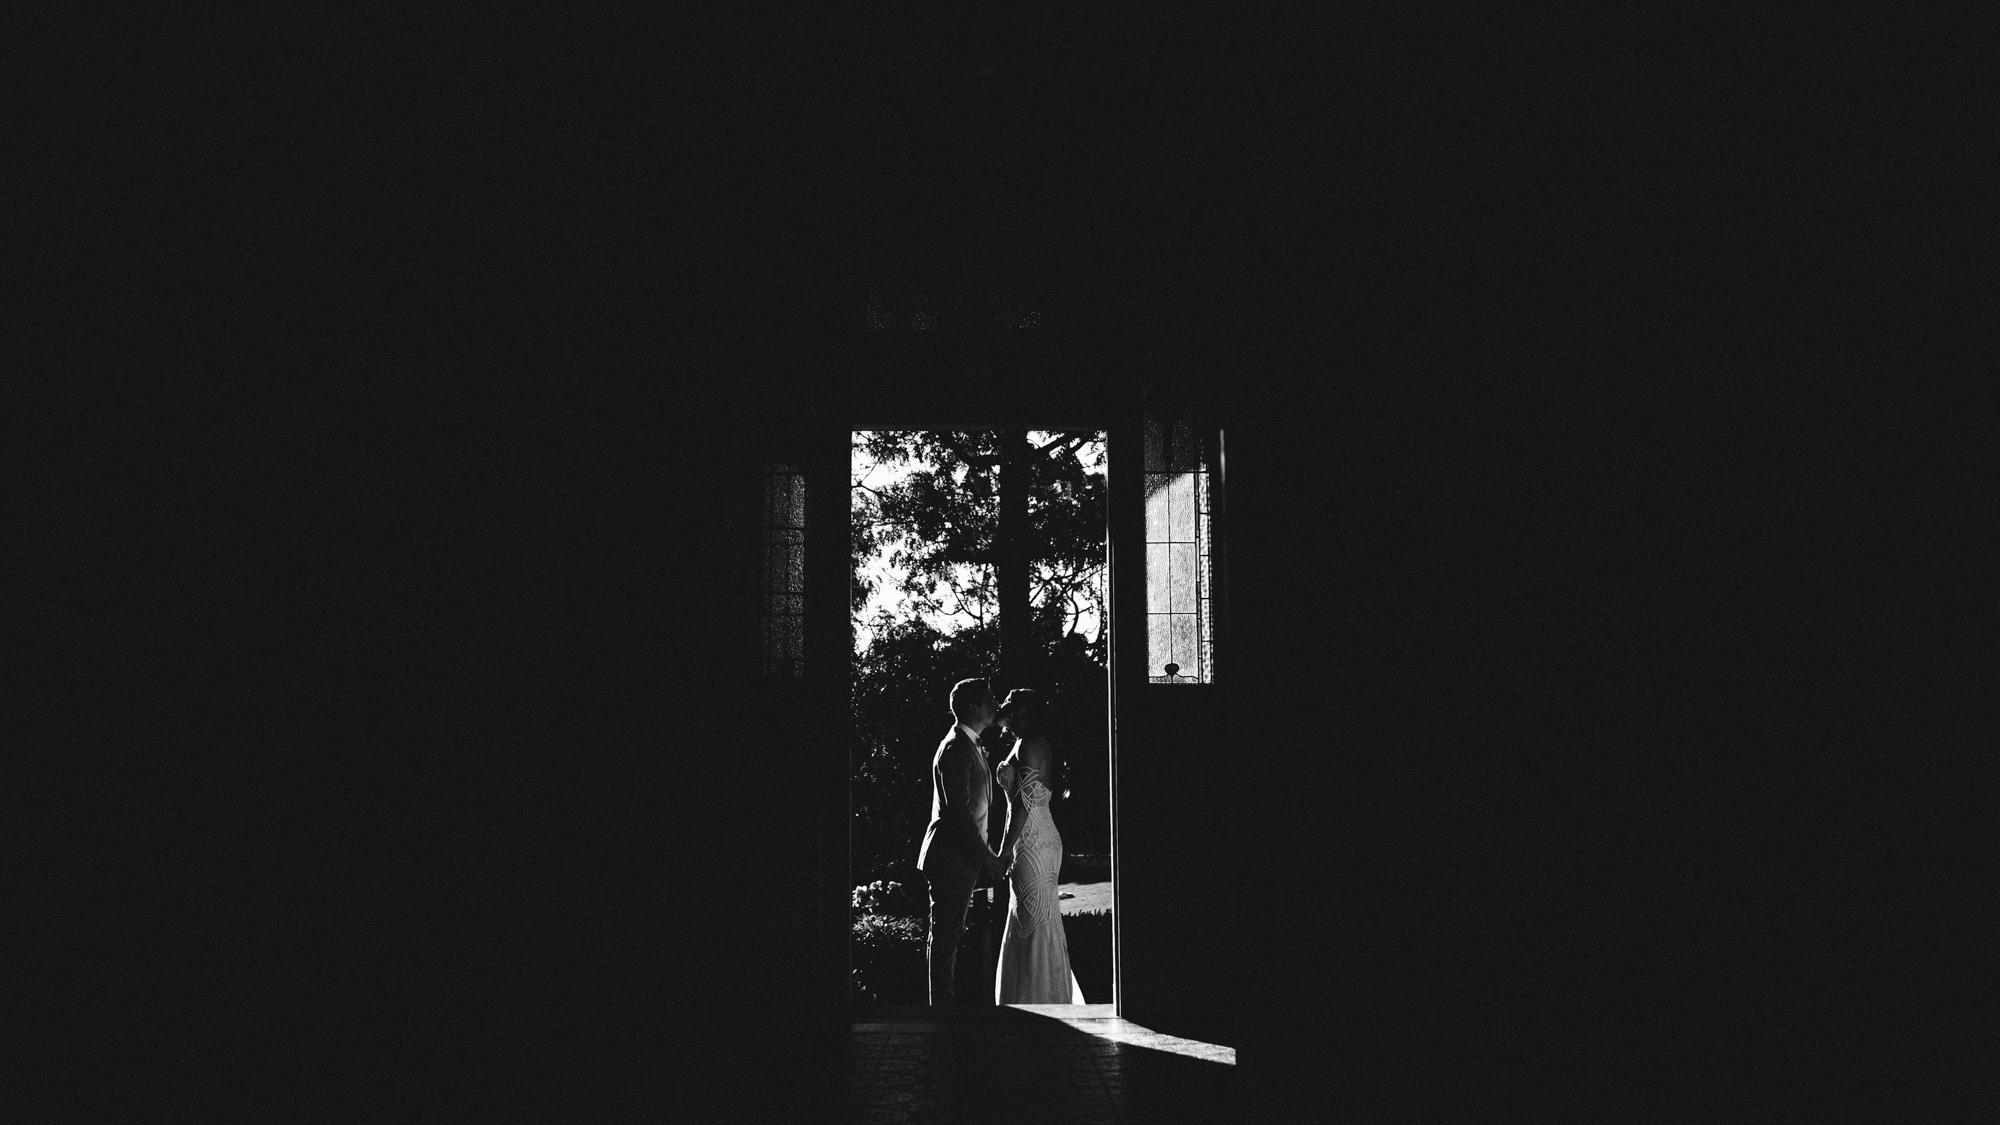 Wedding Photo Melbourne-Dean Raphael-3.jpg